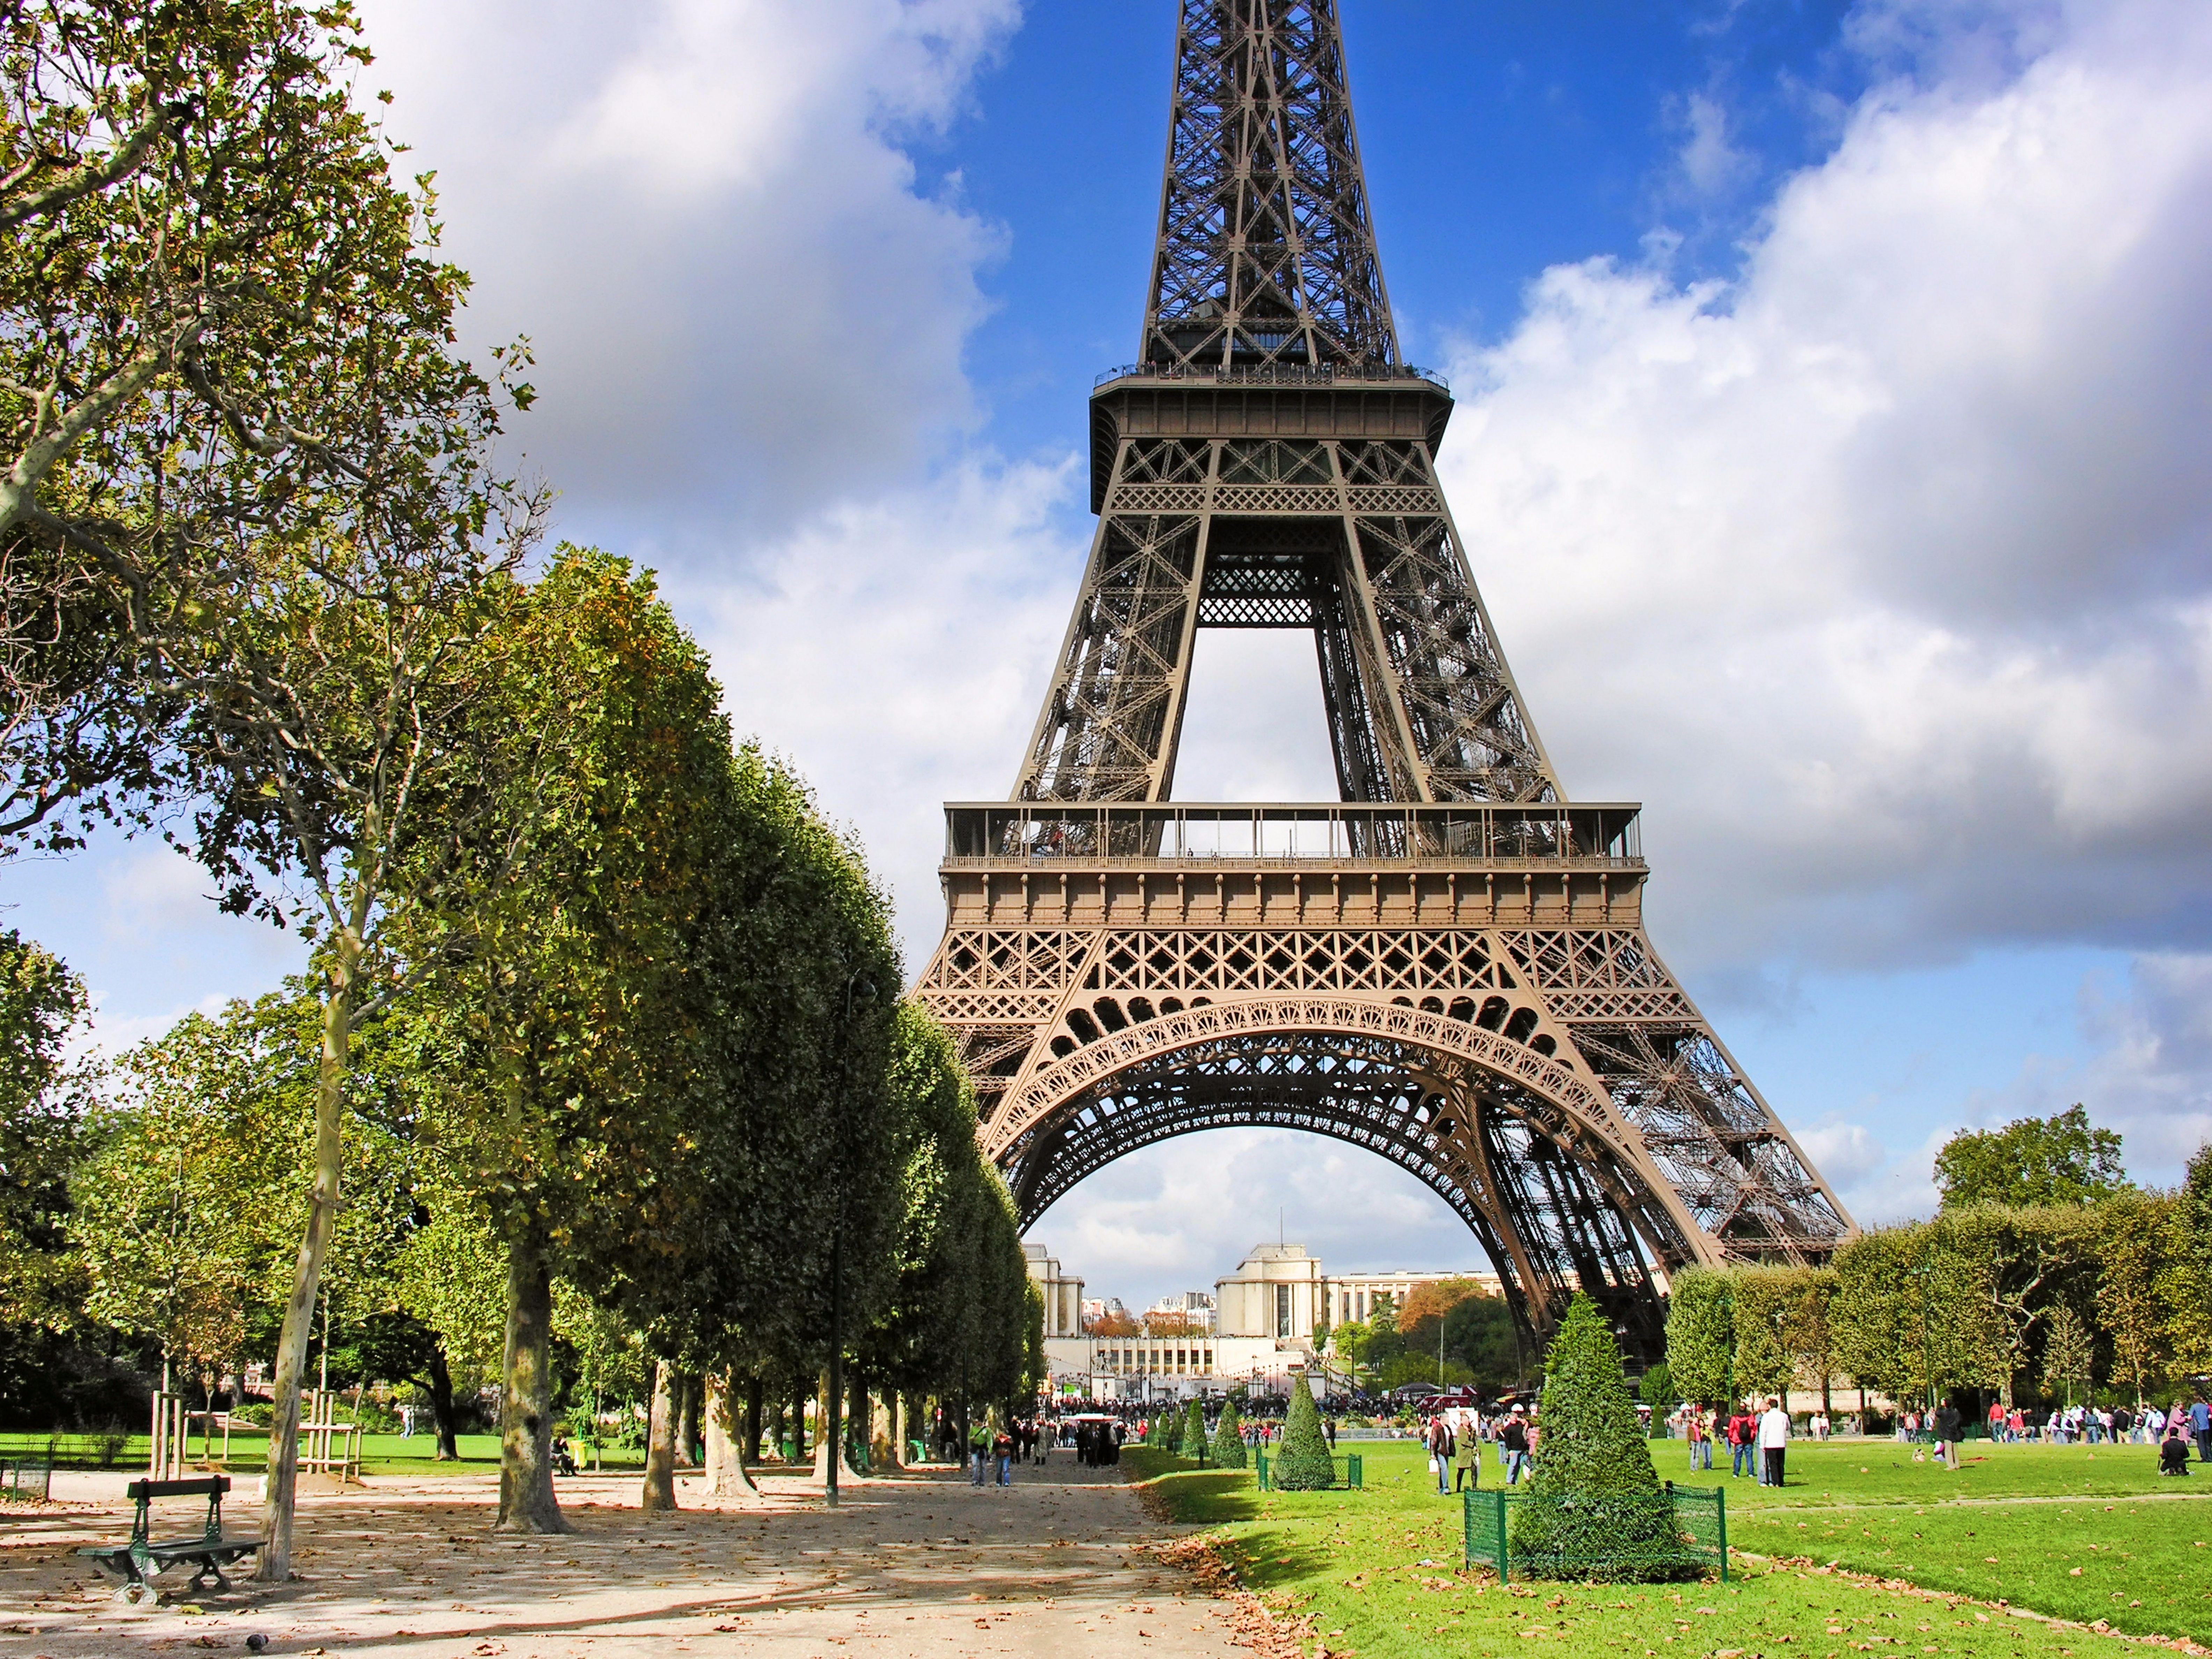 5120x2880 France Paris Champs De Mars 5k Wallpaper Hd City 4k Wallpapers Images Photos And Background